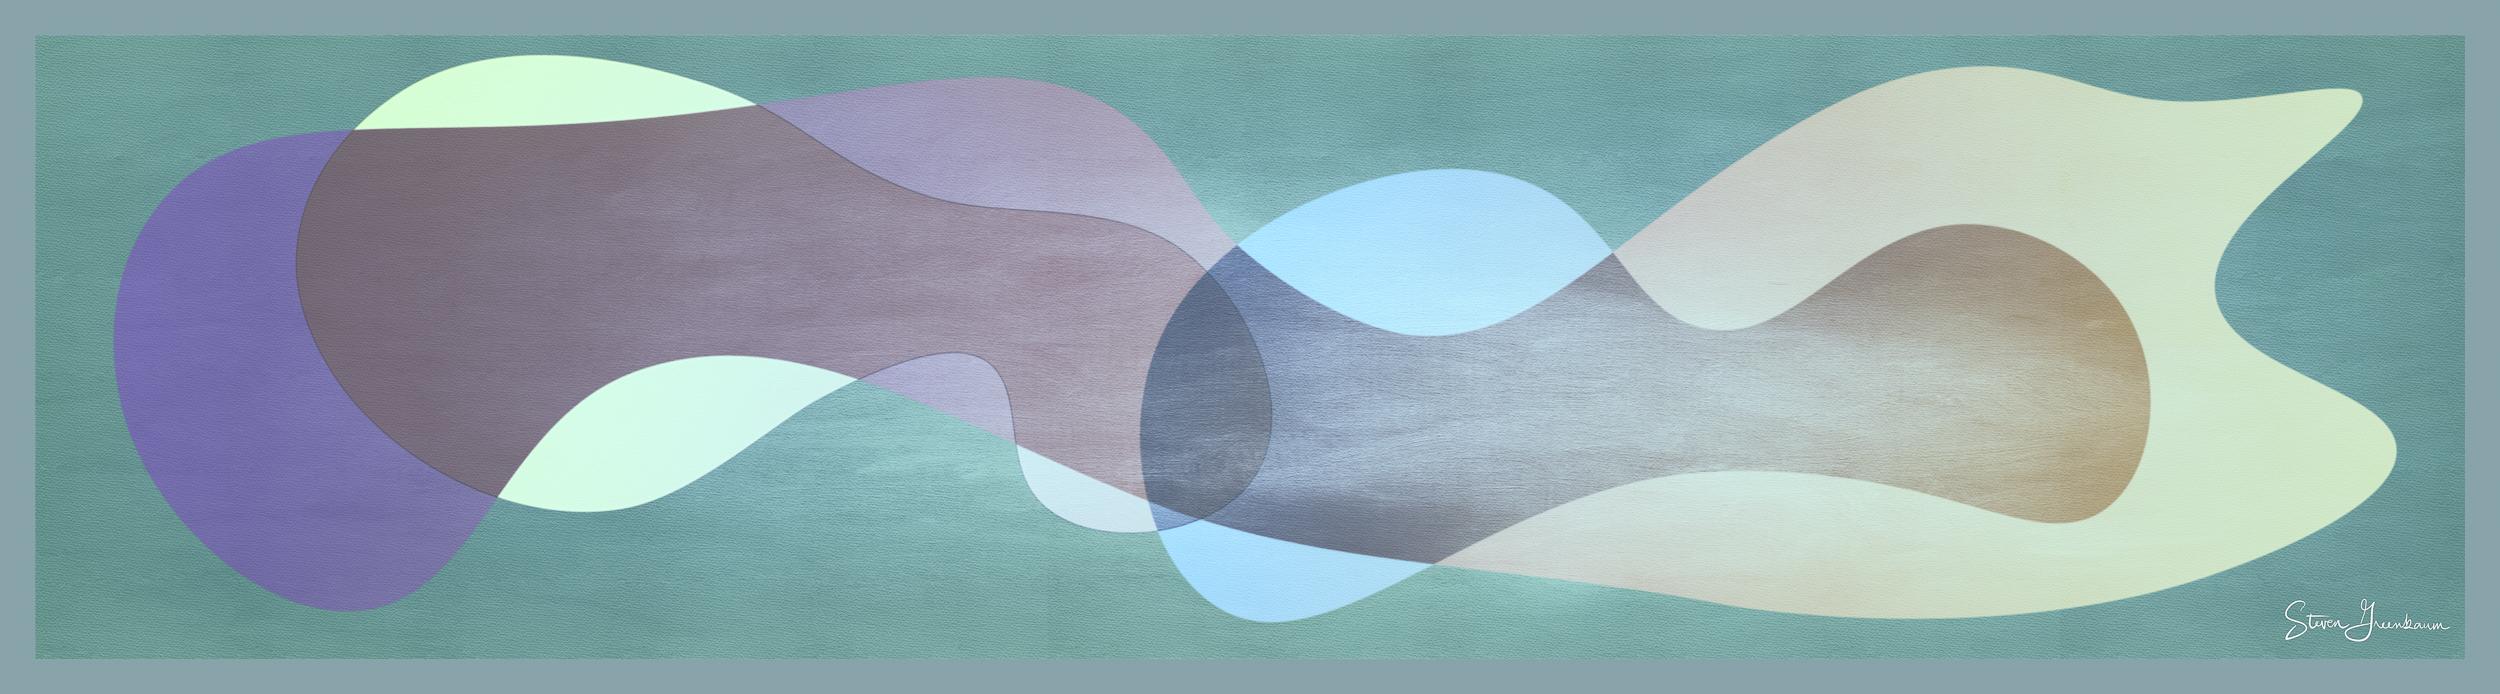 triptych-var 1-Edit-Edit-36x10-maya blue glaze.jpg